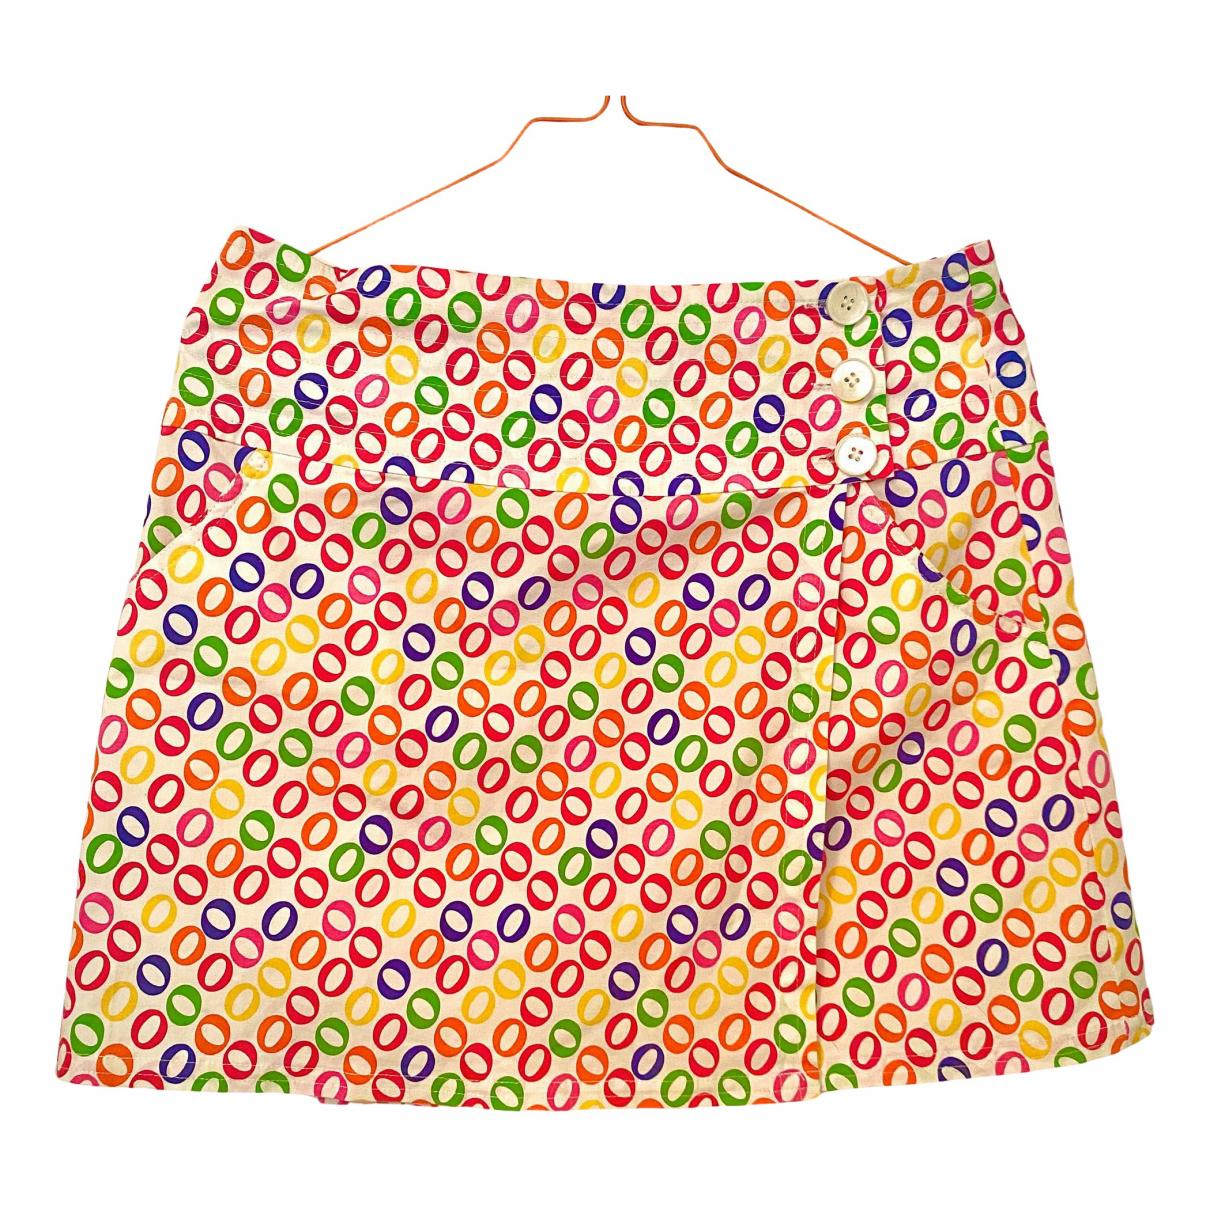 Diane Von Furstenberg N Multicolour Cotton skirt for Women 4 UK